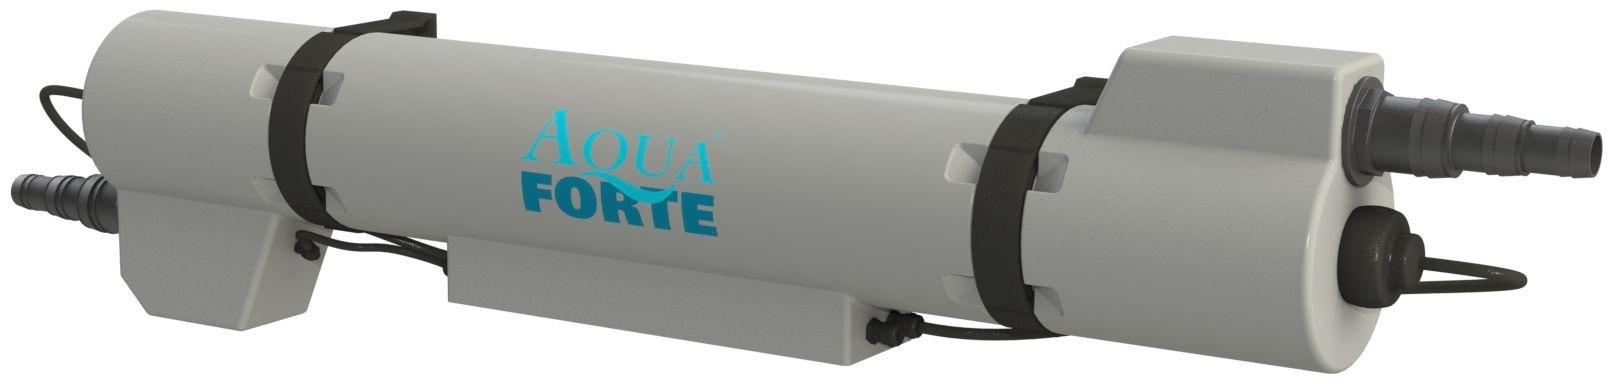 Aquaforte UVC Pure TL 55 Watt